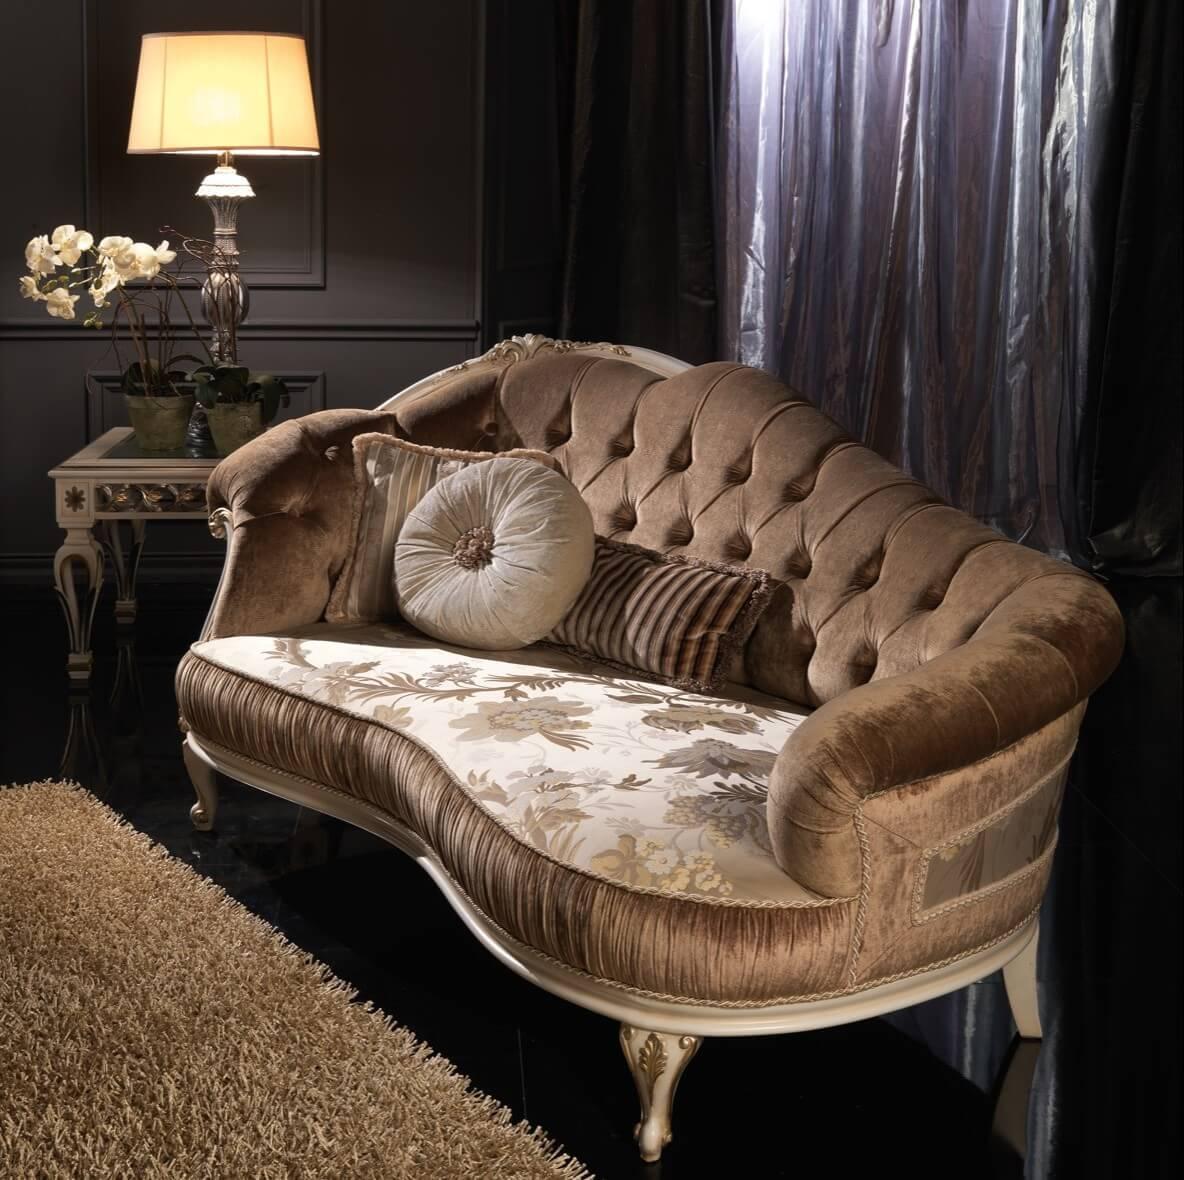 r camiere paolina ph nix sch ner leben. Black Bedroom Furniture Sets. Home Design Ideas